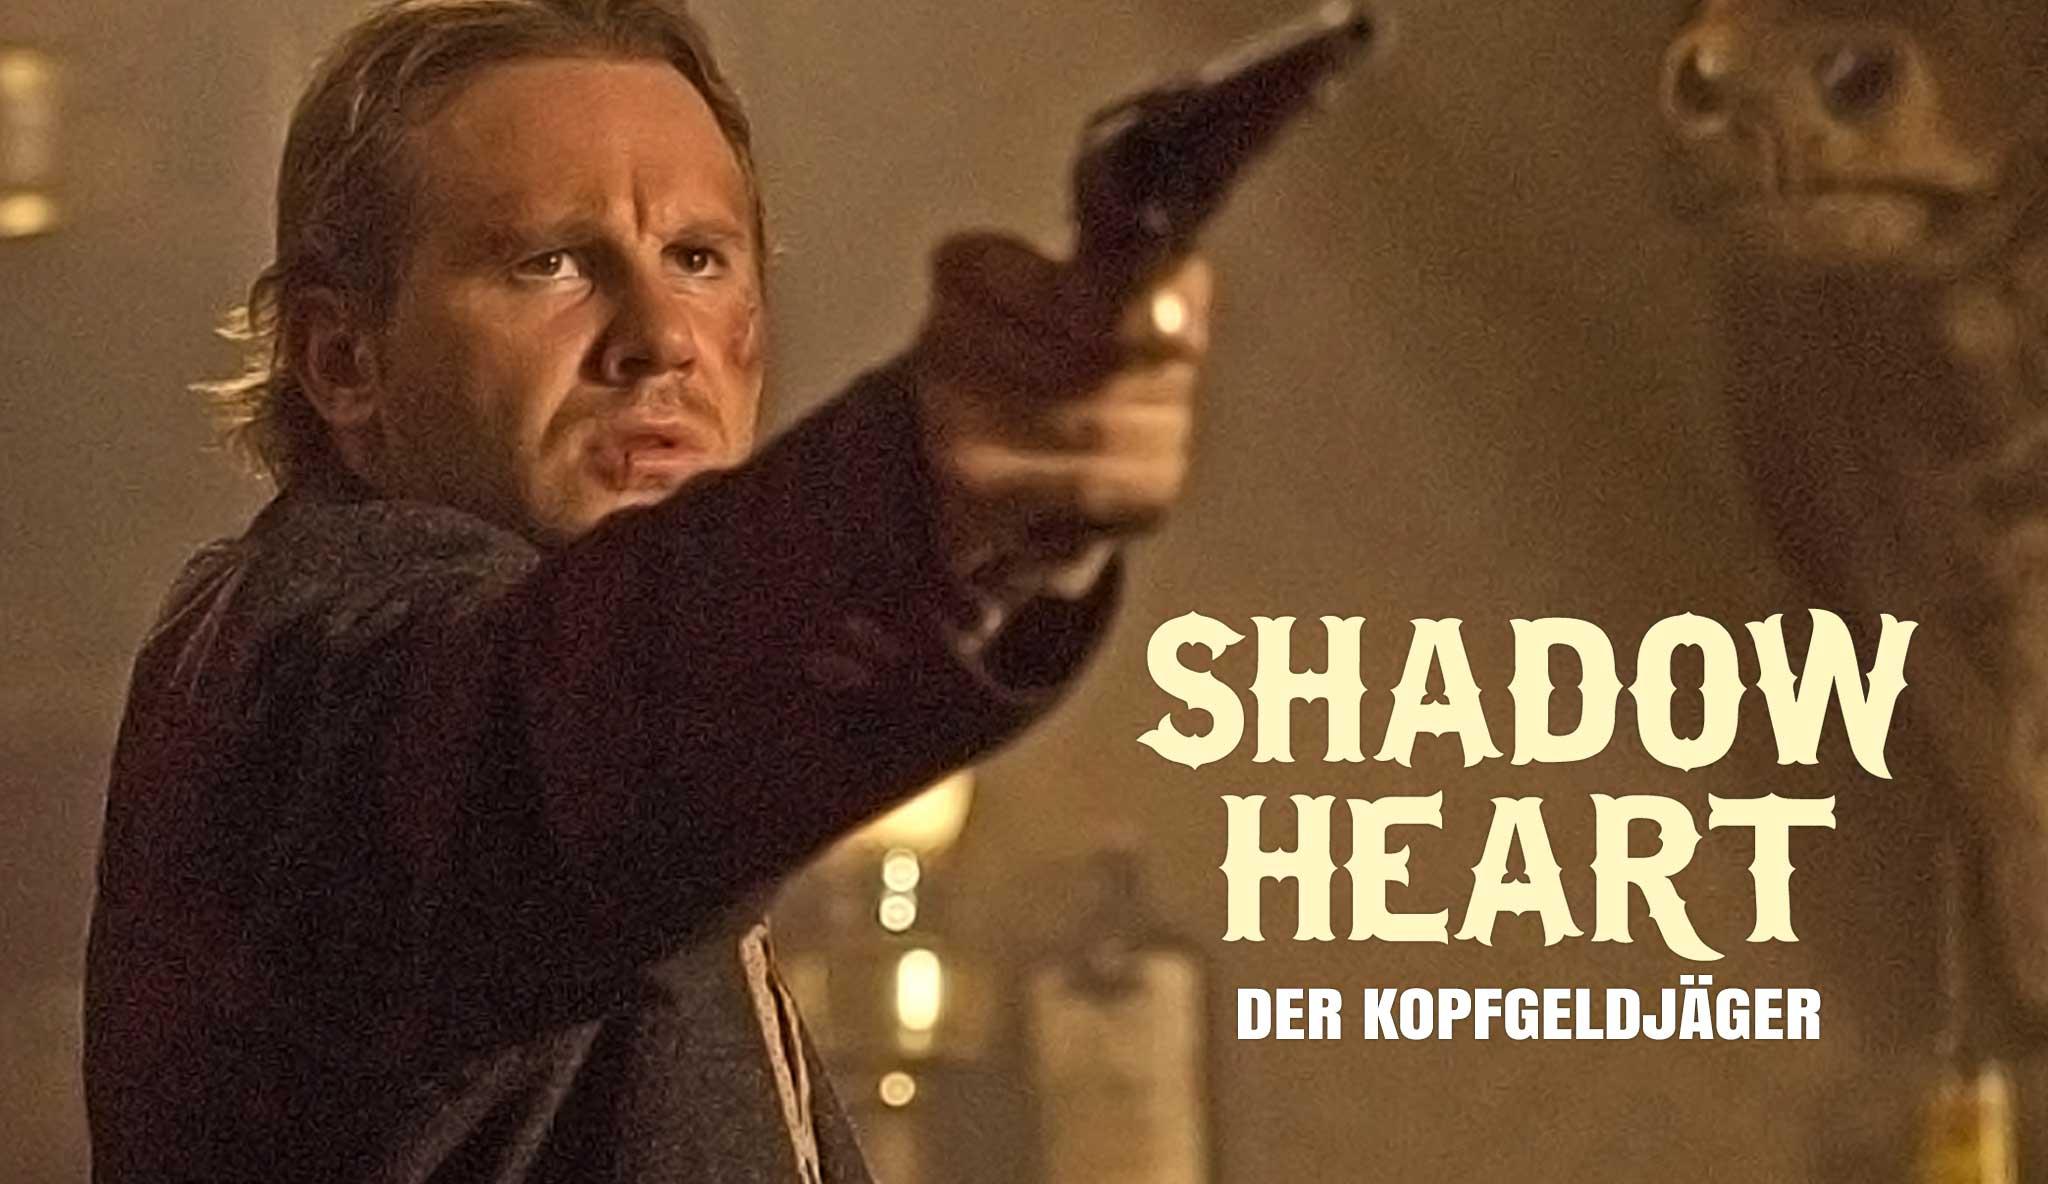 shadowheart\header.jpg